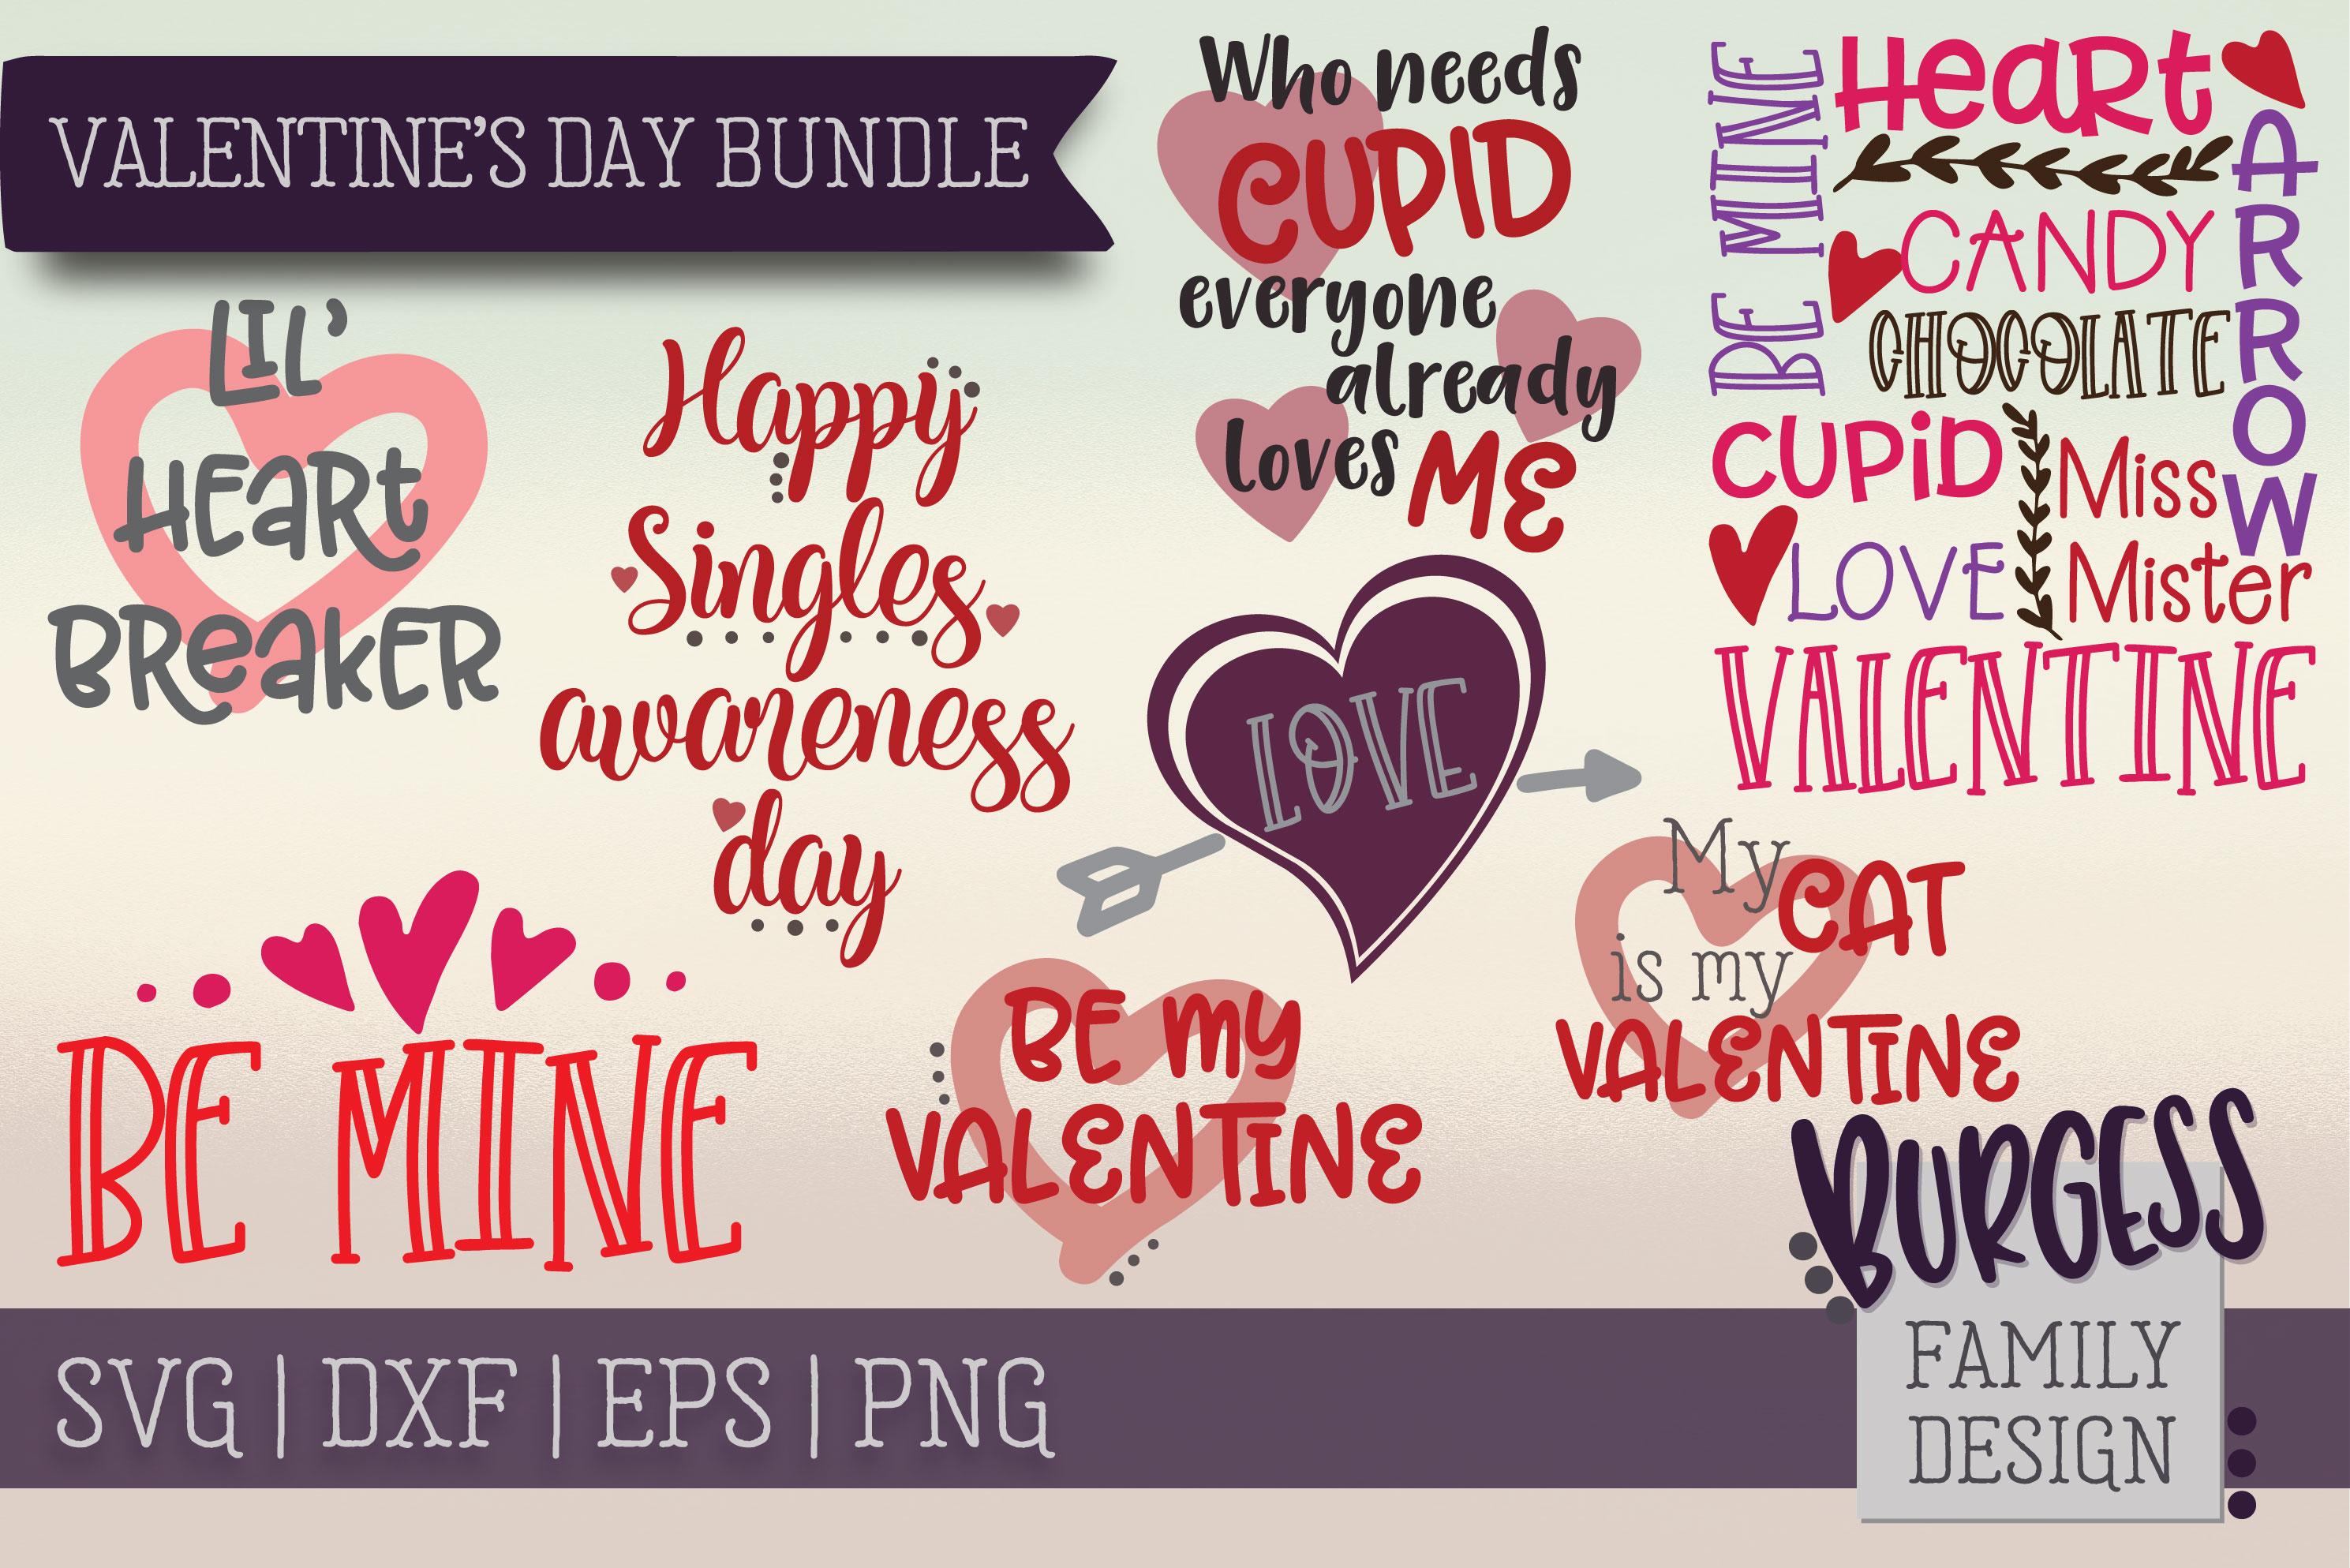 Valentine's Day Bundle | SVG DXF EPS PNG example image 1